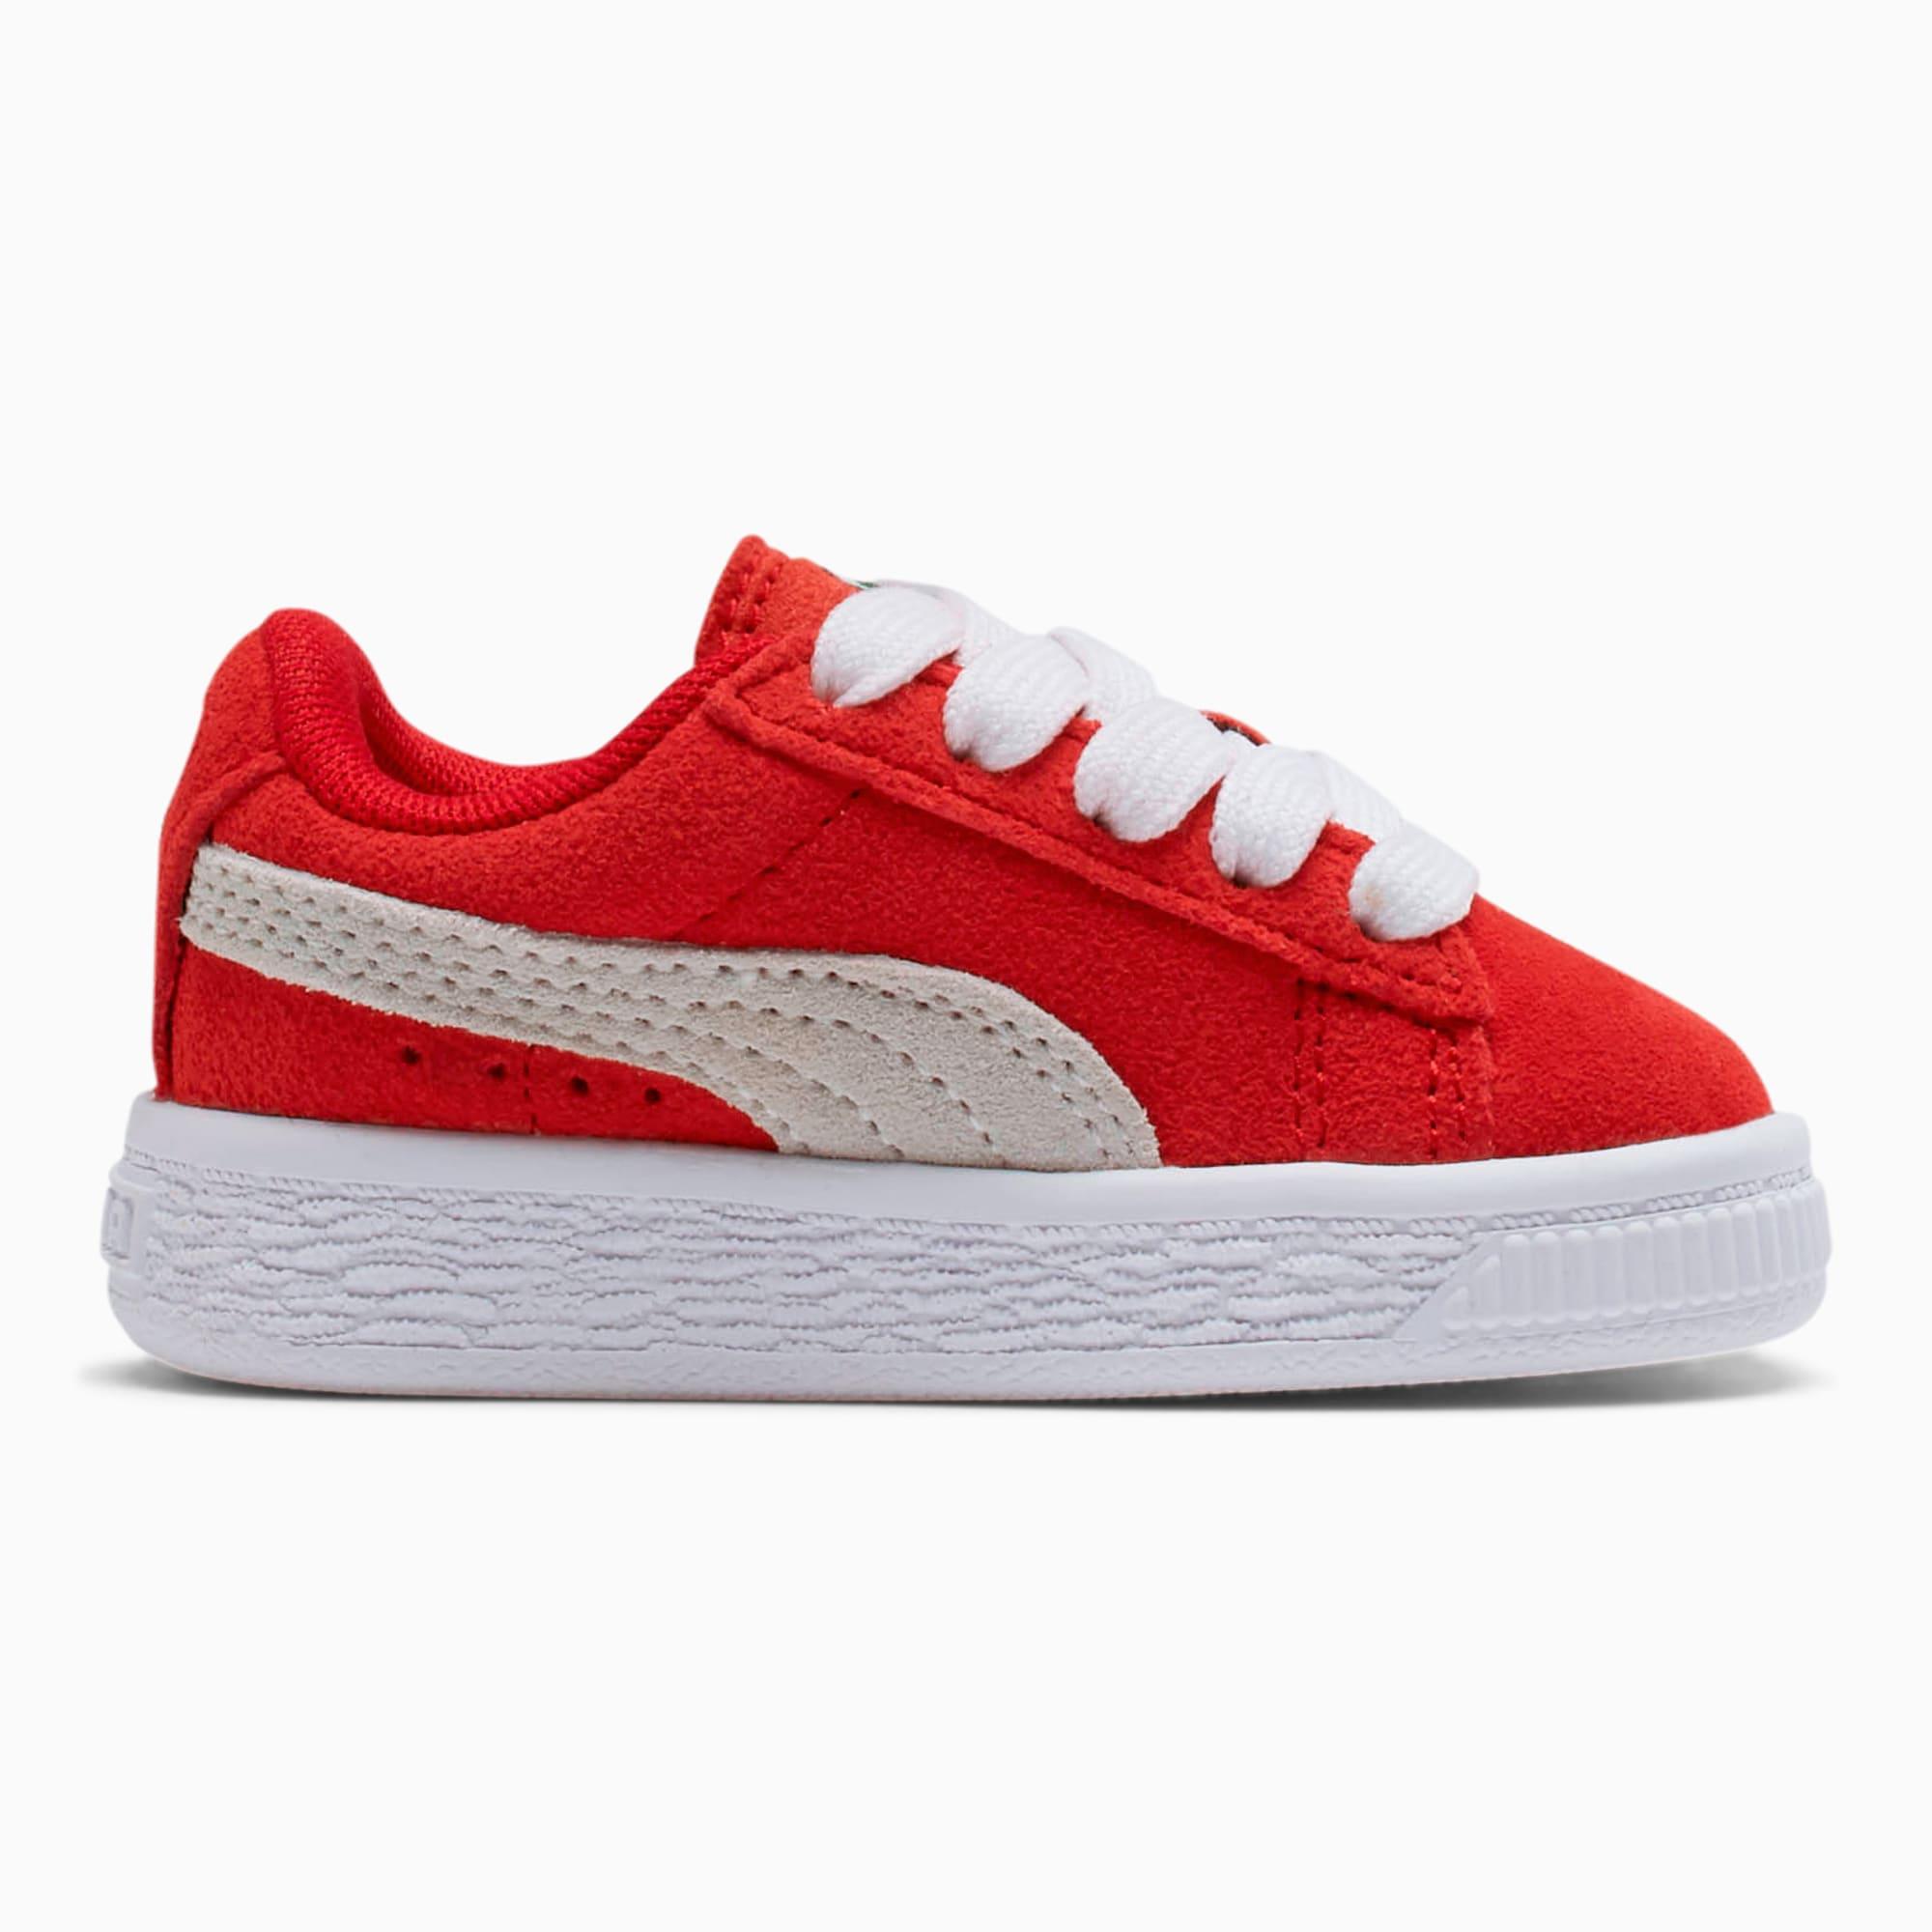 puma suede red white